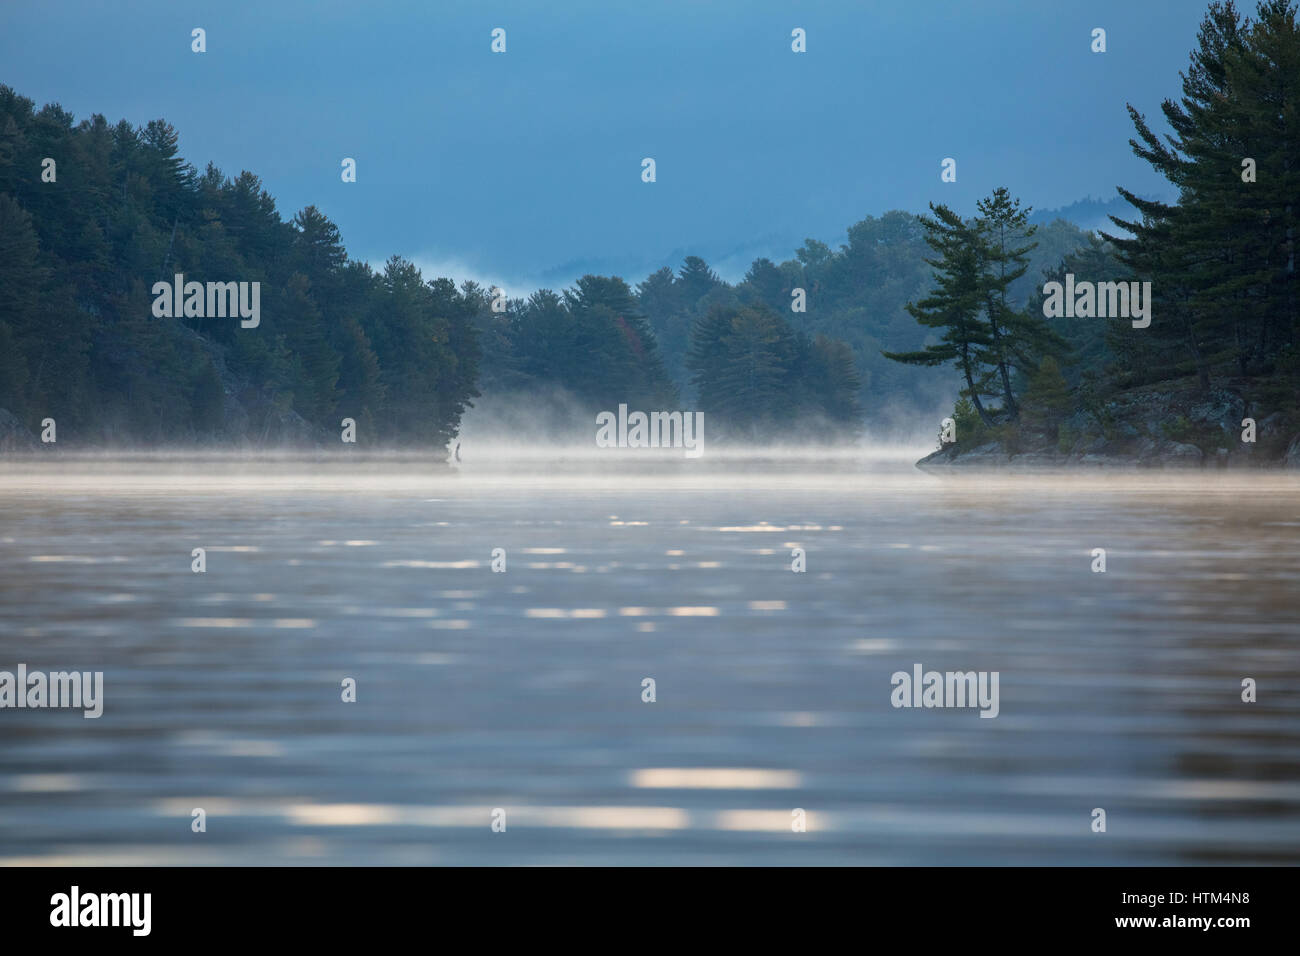 Charlton Lake à l'aube, l'Ontario, Canada Banque D'Images